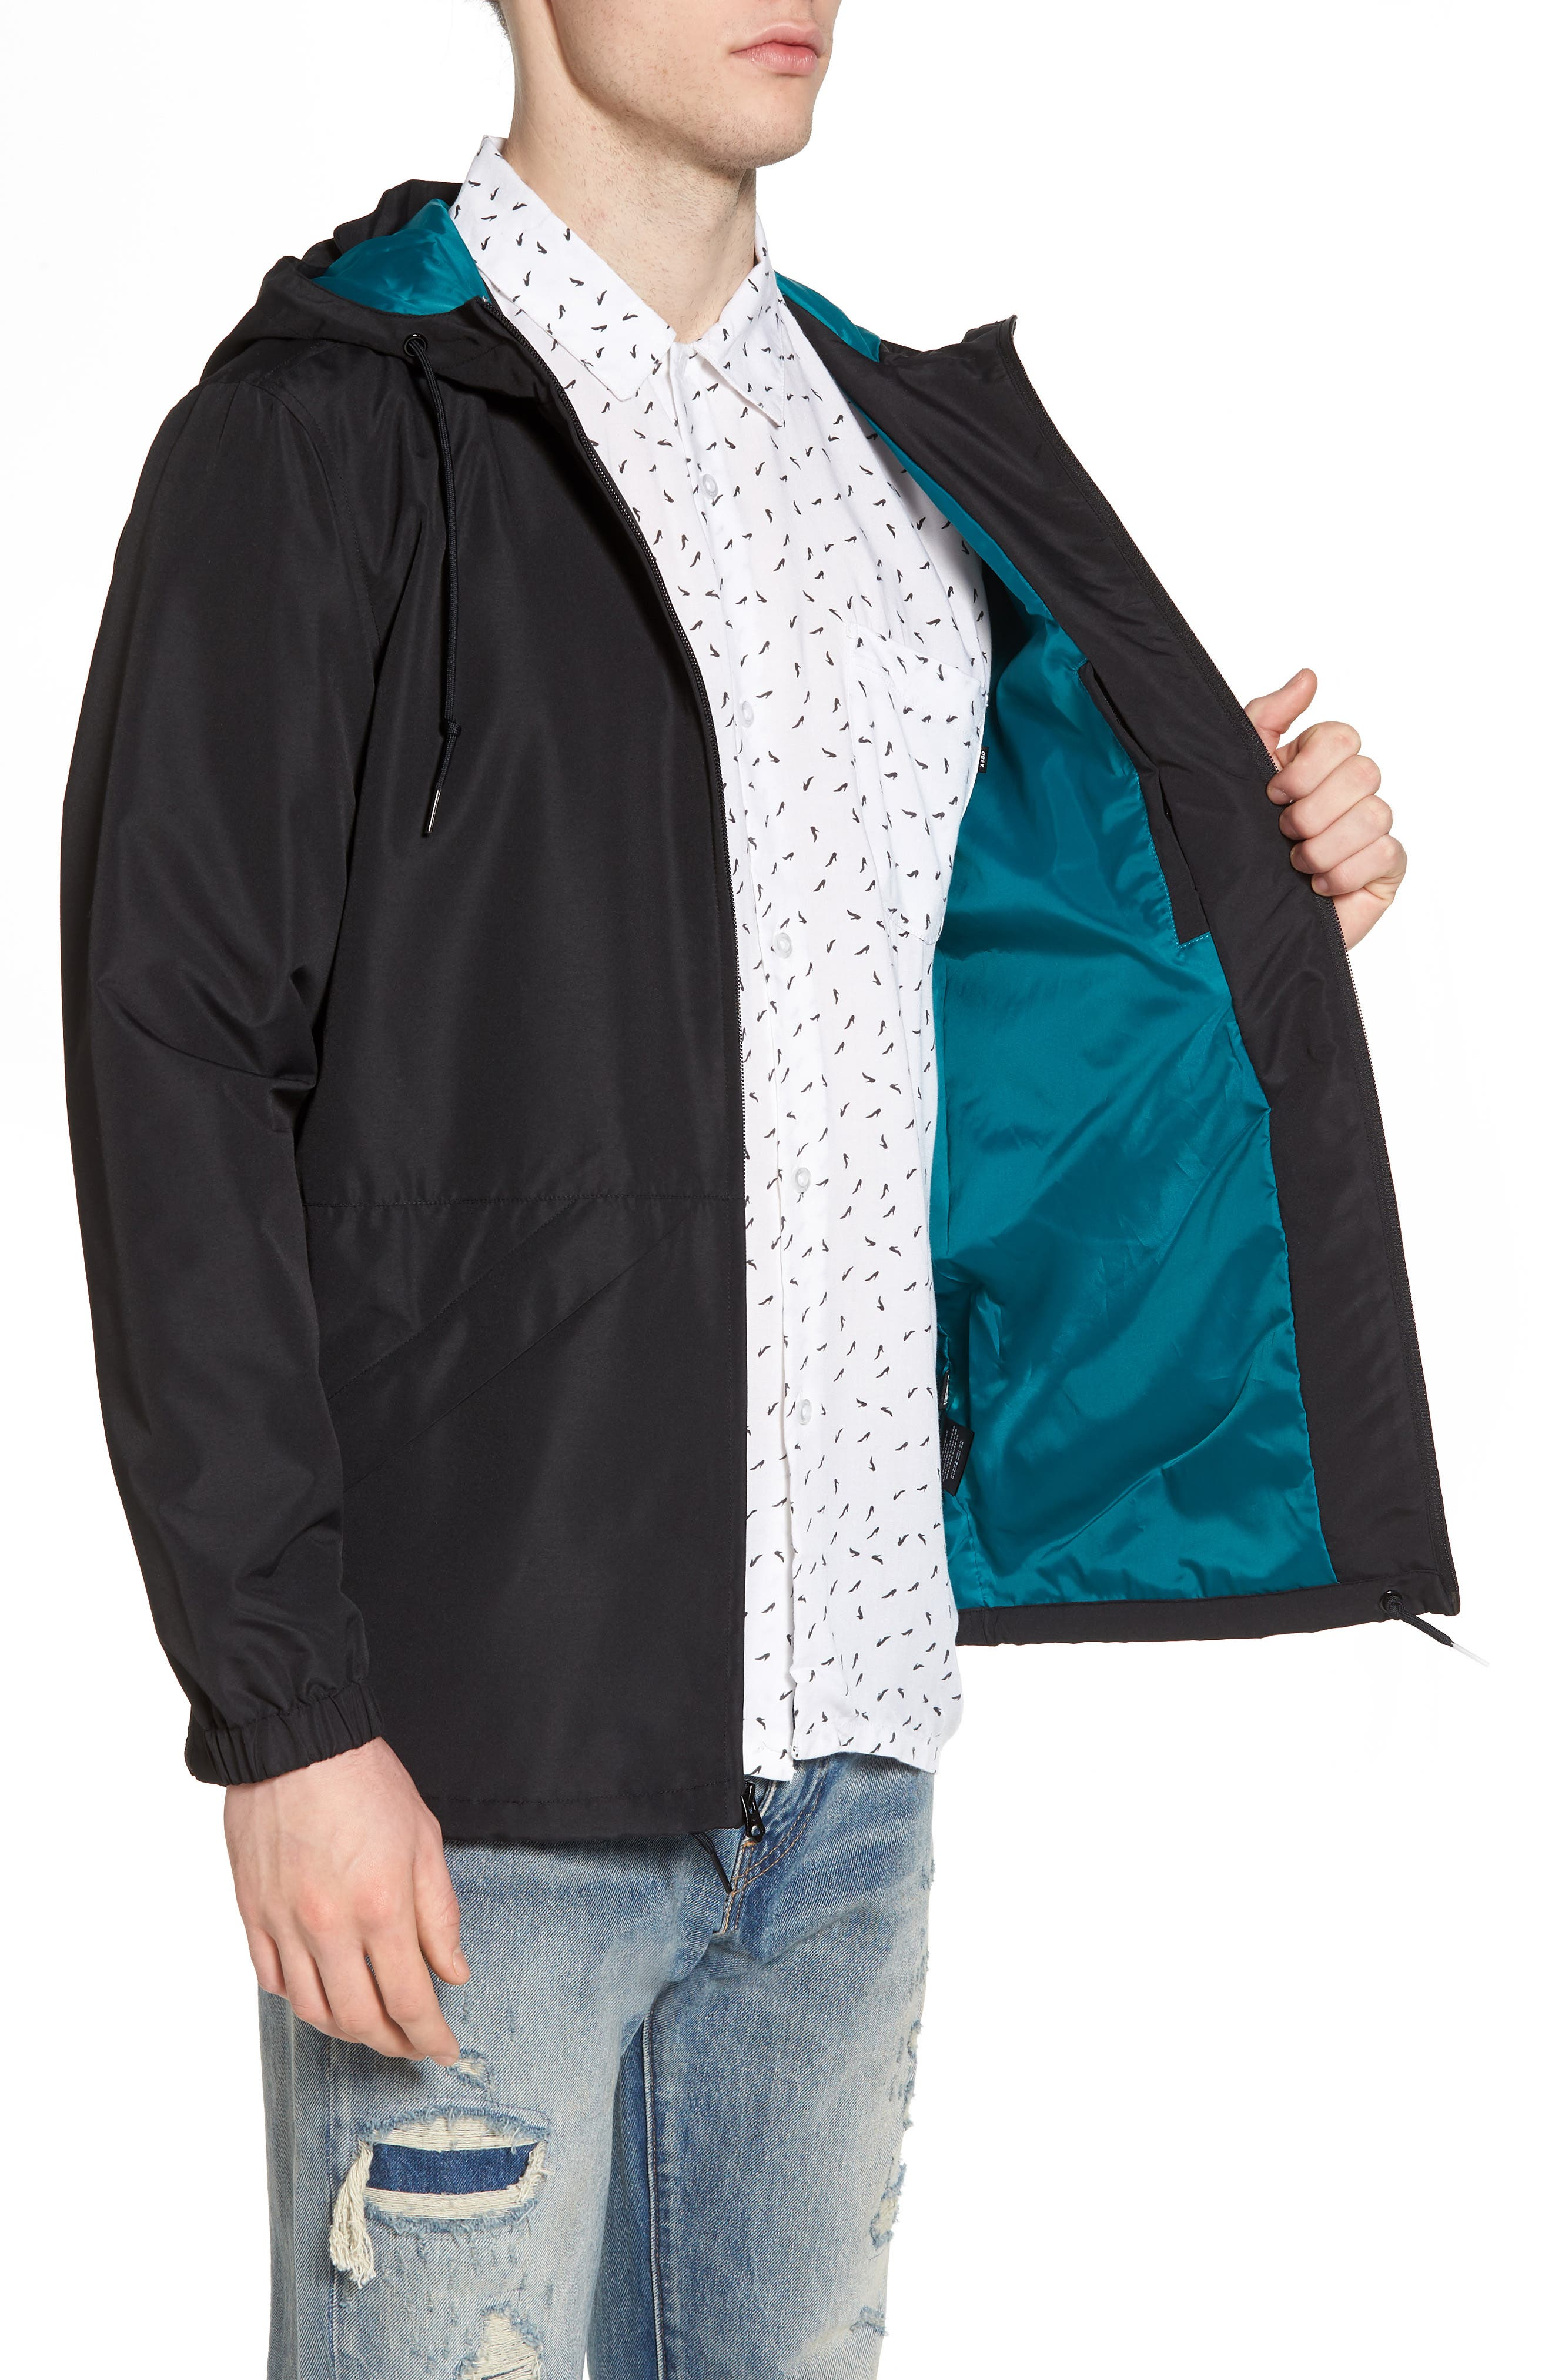 Ambush Hooded Jacket,                             Alternate thumbnail 3, color,                             Black